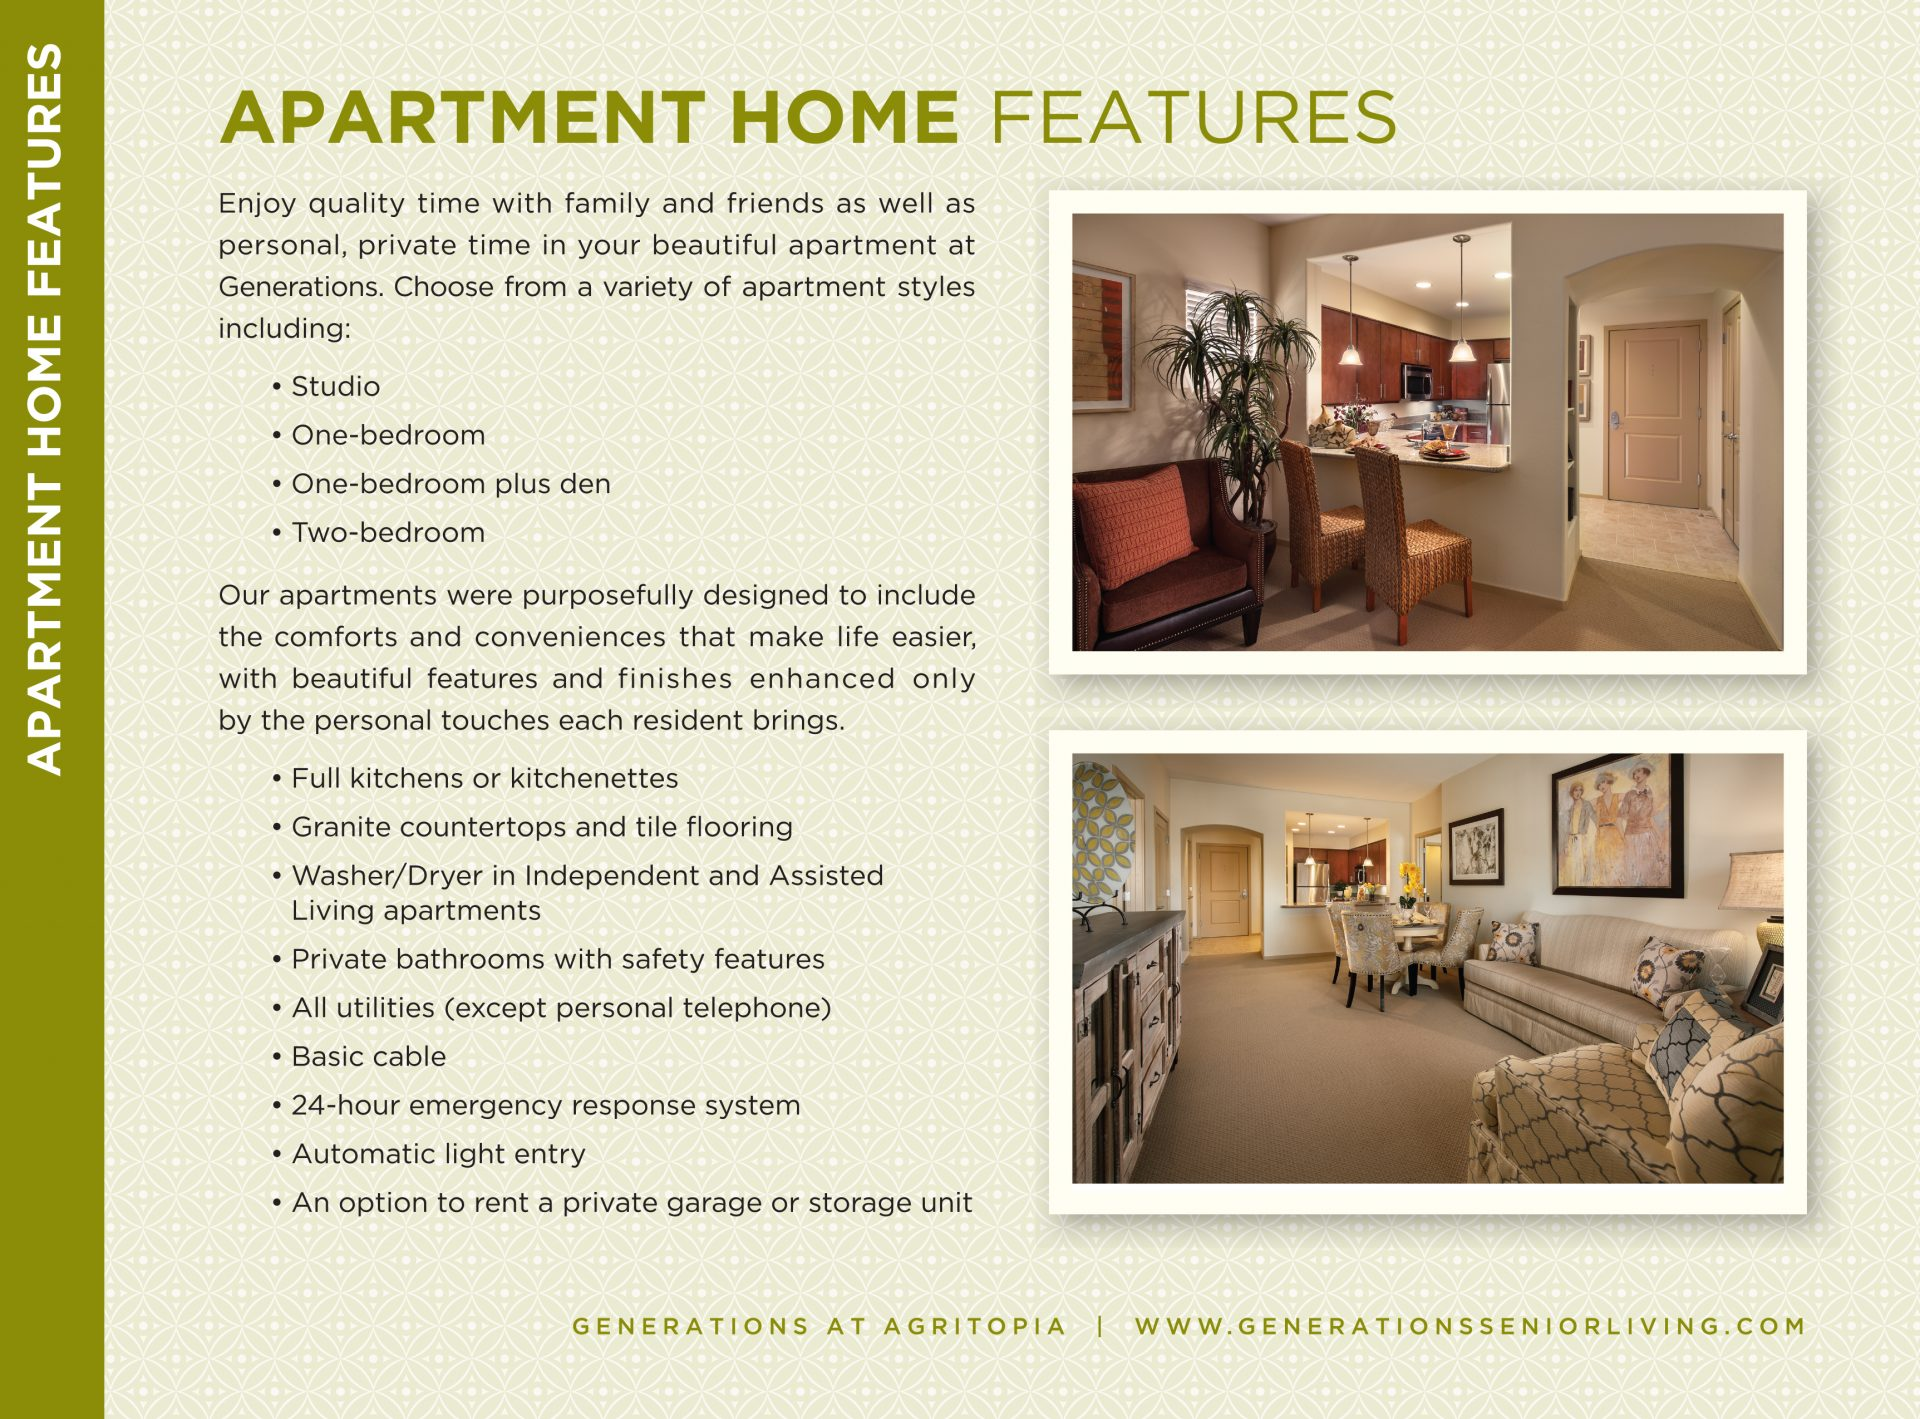 Apartment Home Features insert, Generations Agritopia, Lori Pasulka